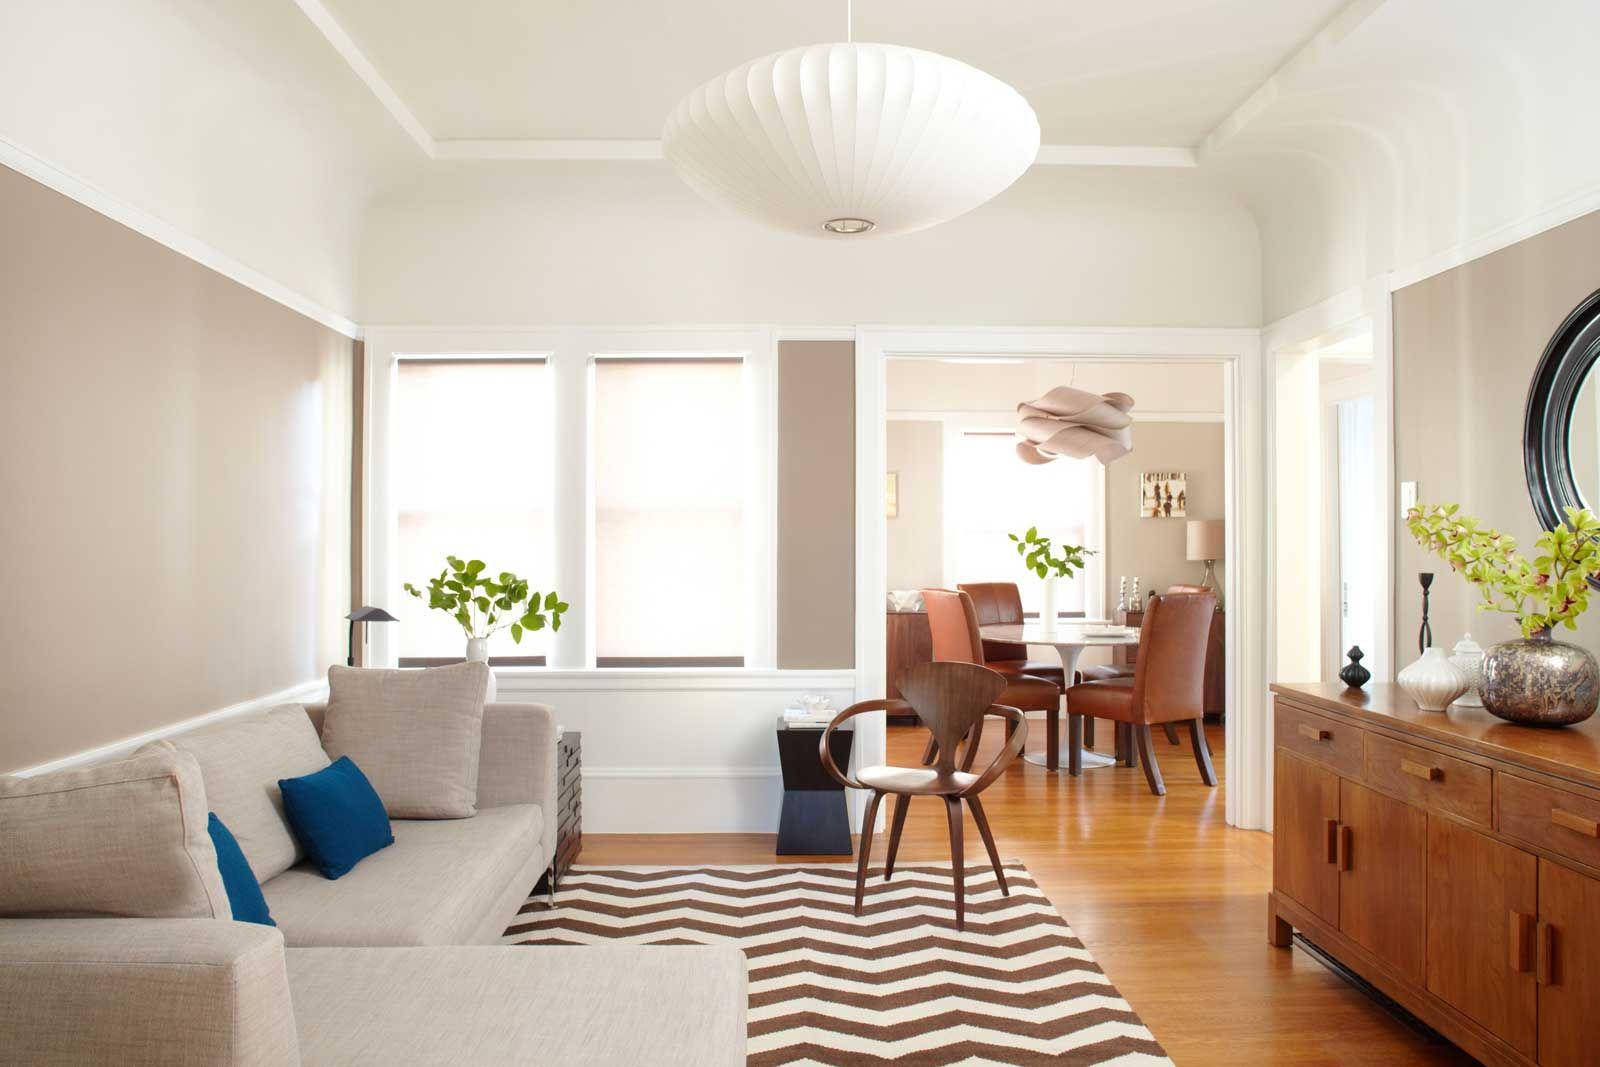 Modernsimplelivingroominteriordesignwithwhitelivingroom Impressive Living Room Wall Colors Review